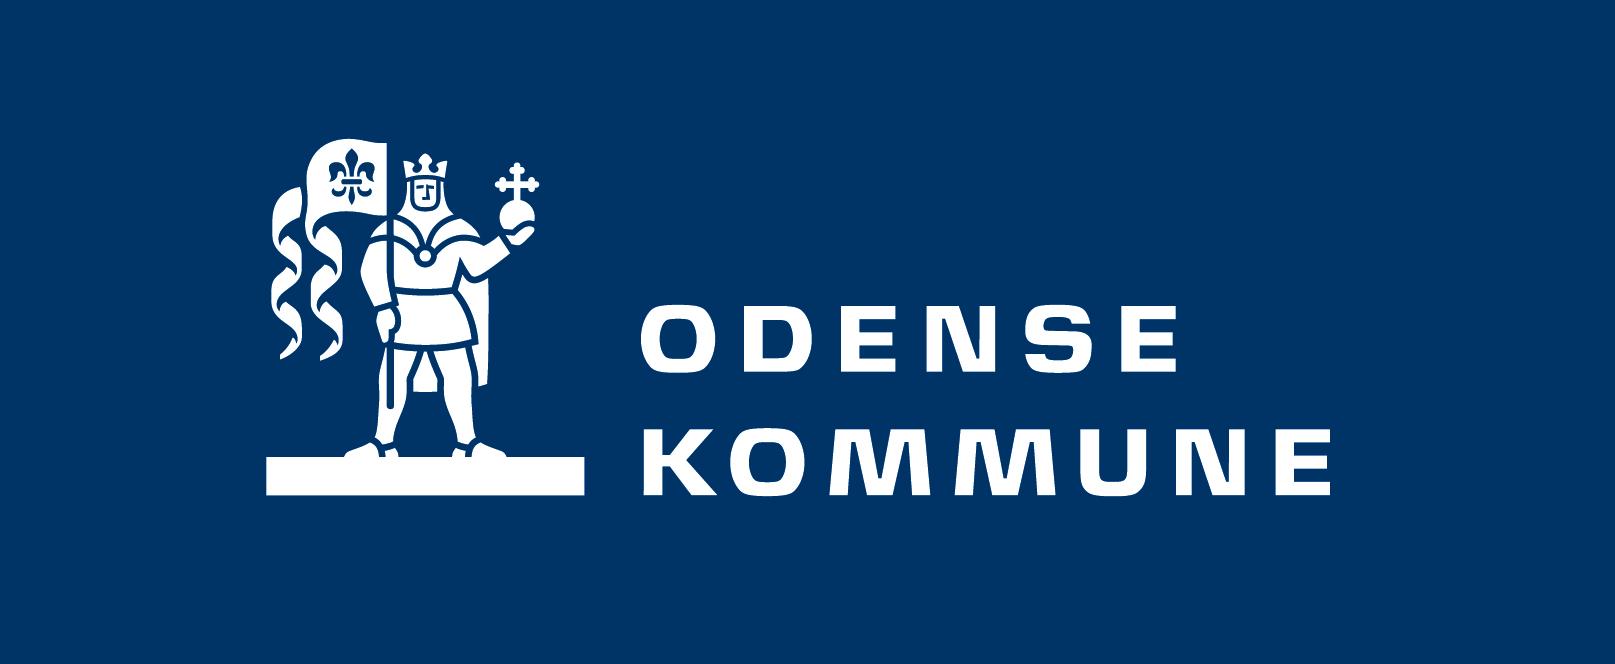 Odense Kommune.jpg